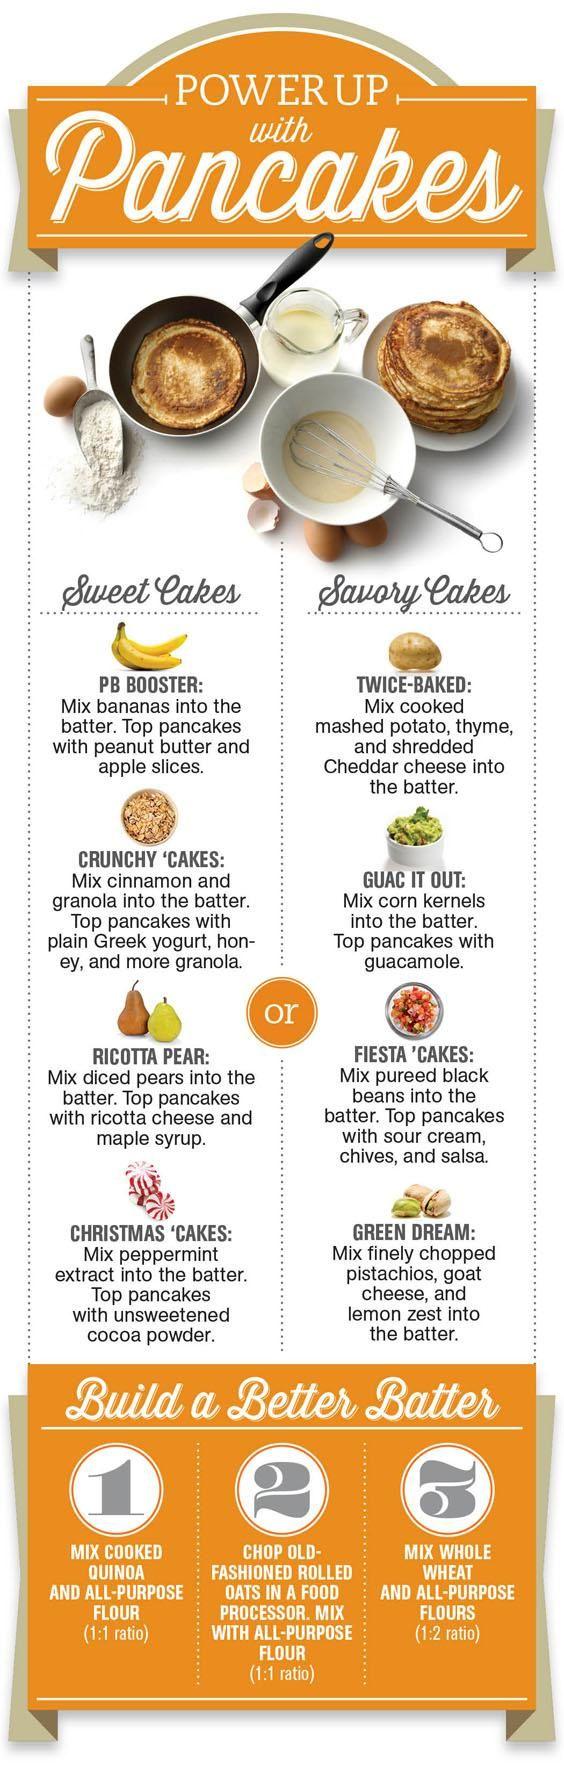 Make Healthier Pancakes